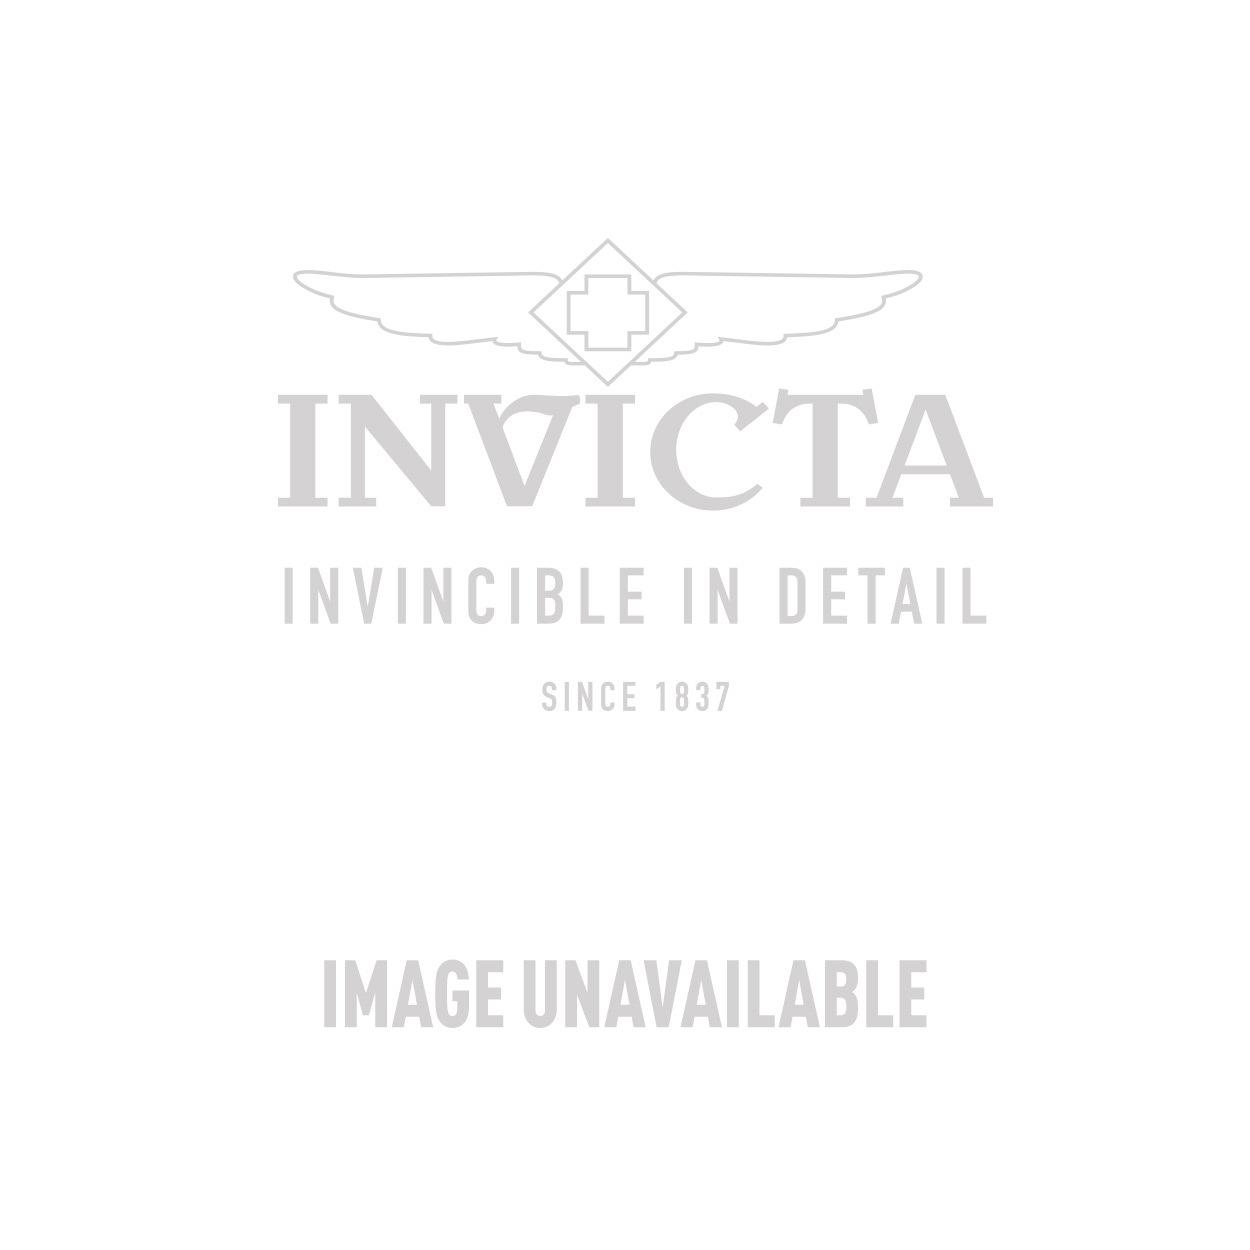 Invicta Watch Case DC3GREY/RED